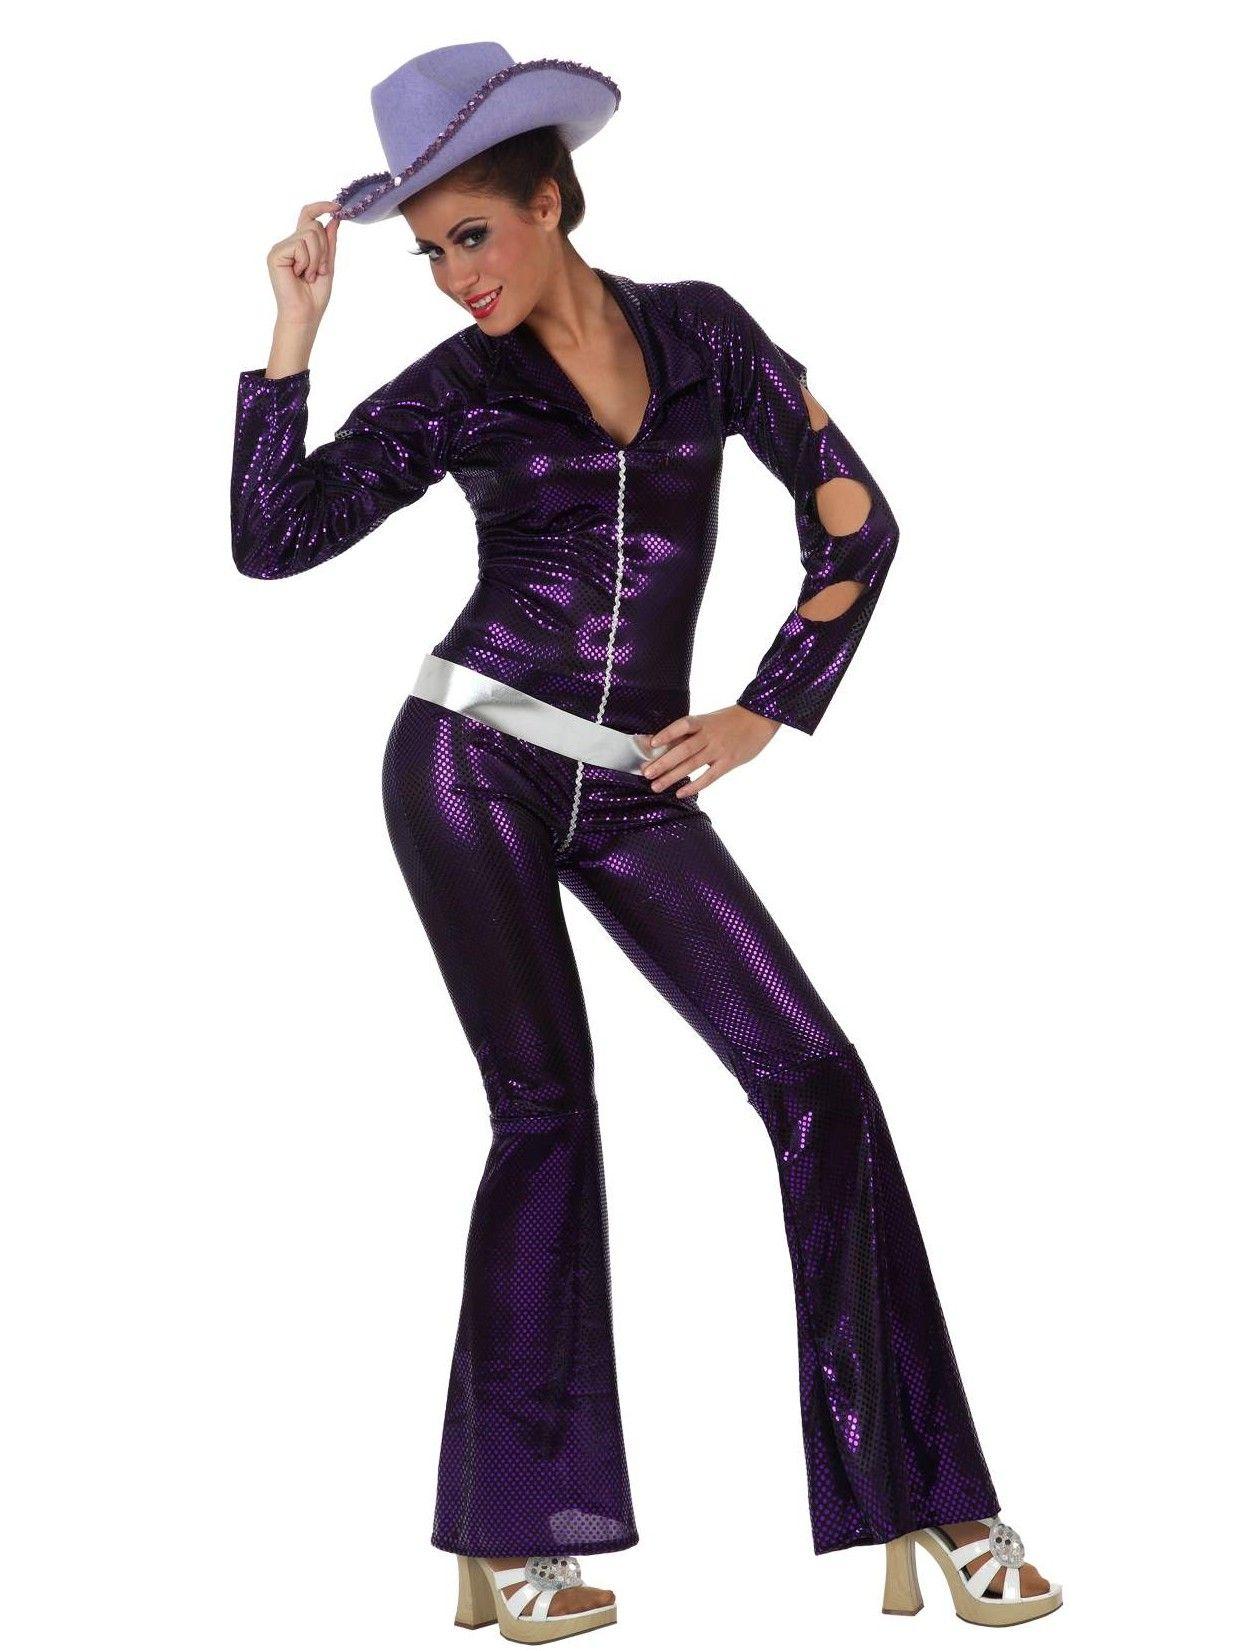 D guisement disco femme d guisements disco pour femme pinterest deguisement disco - Idee deguisement annee 80 pas cher ...